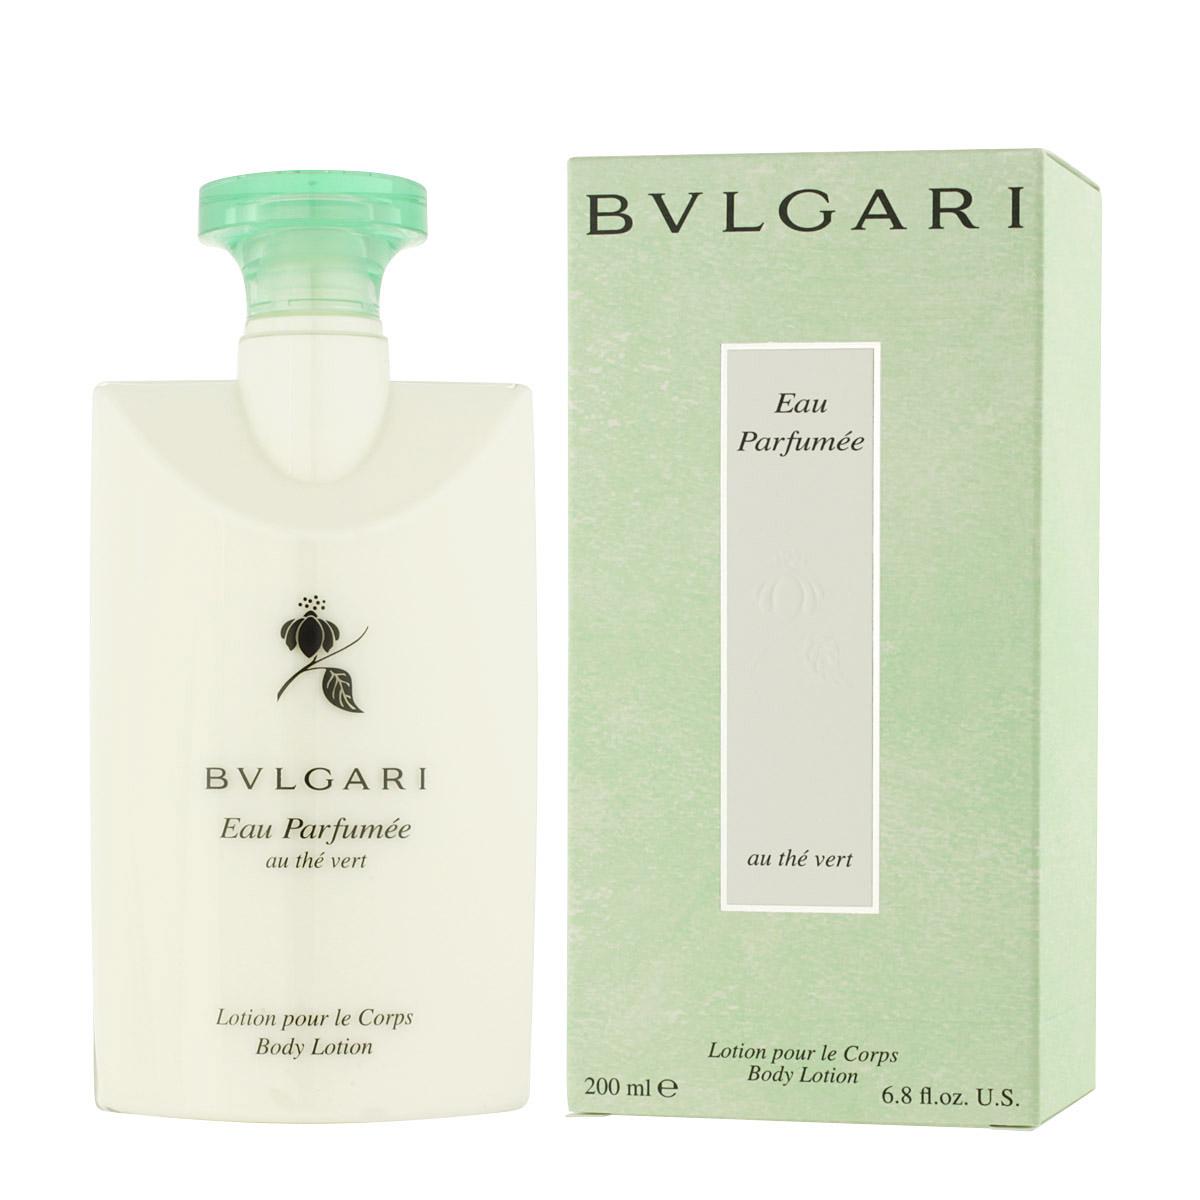 Bvlgari Eau Parfumée au Thé Vert BL 200 ml UNISEX